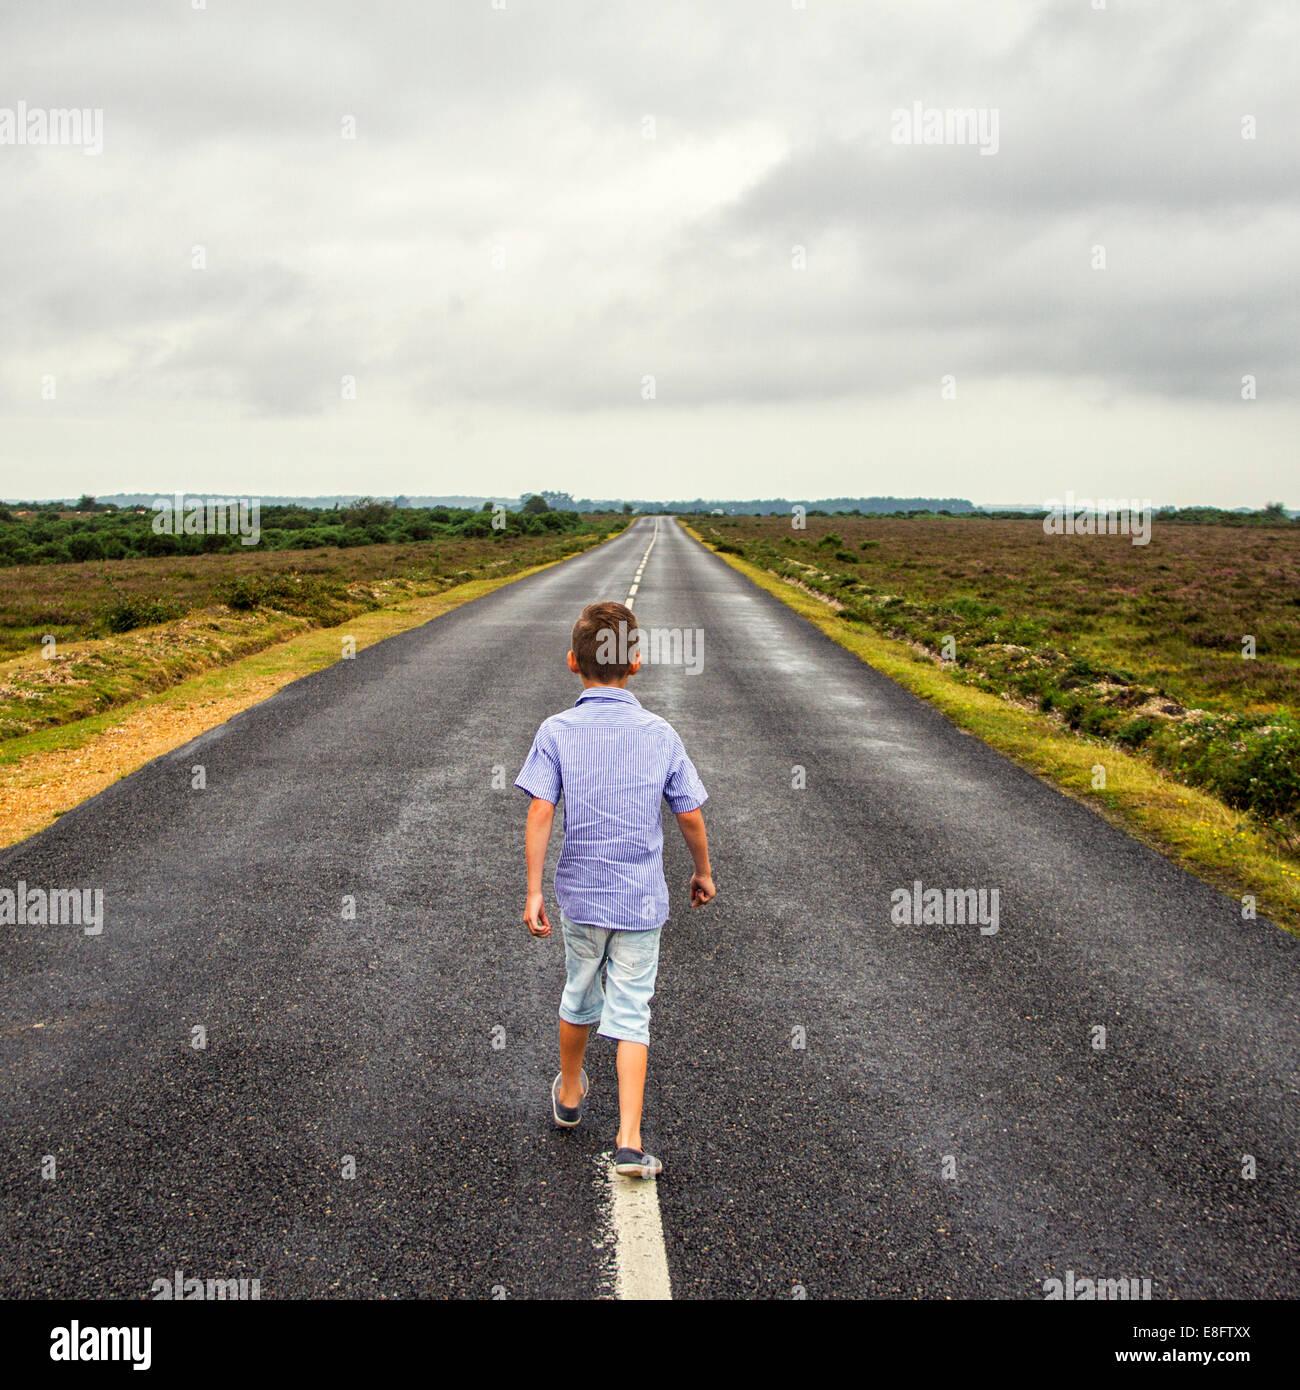 Lone boy walking down long road - Stock Image